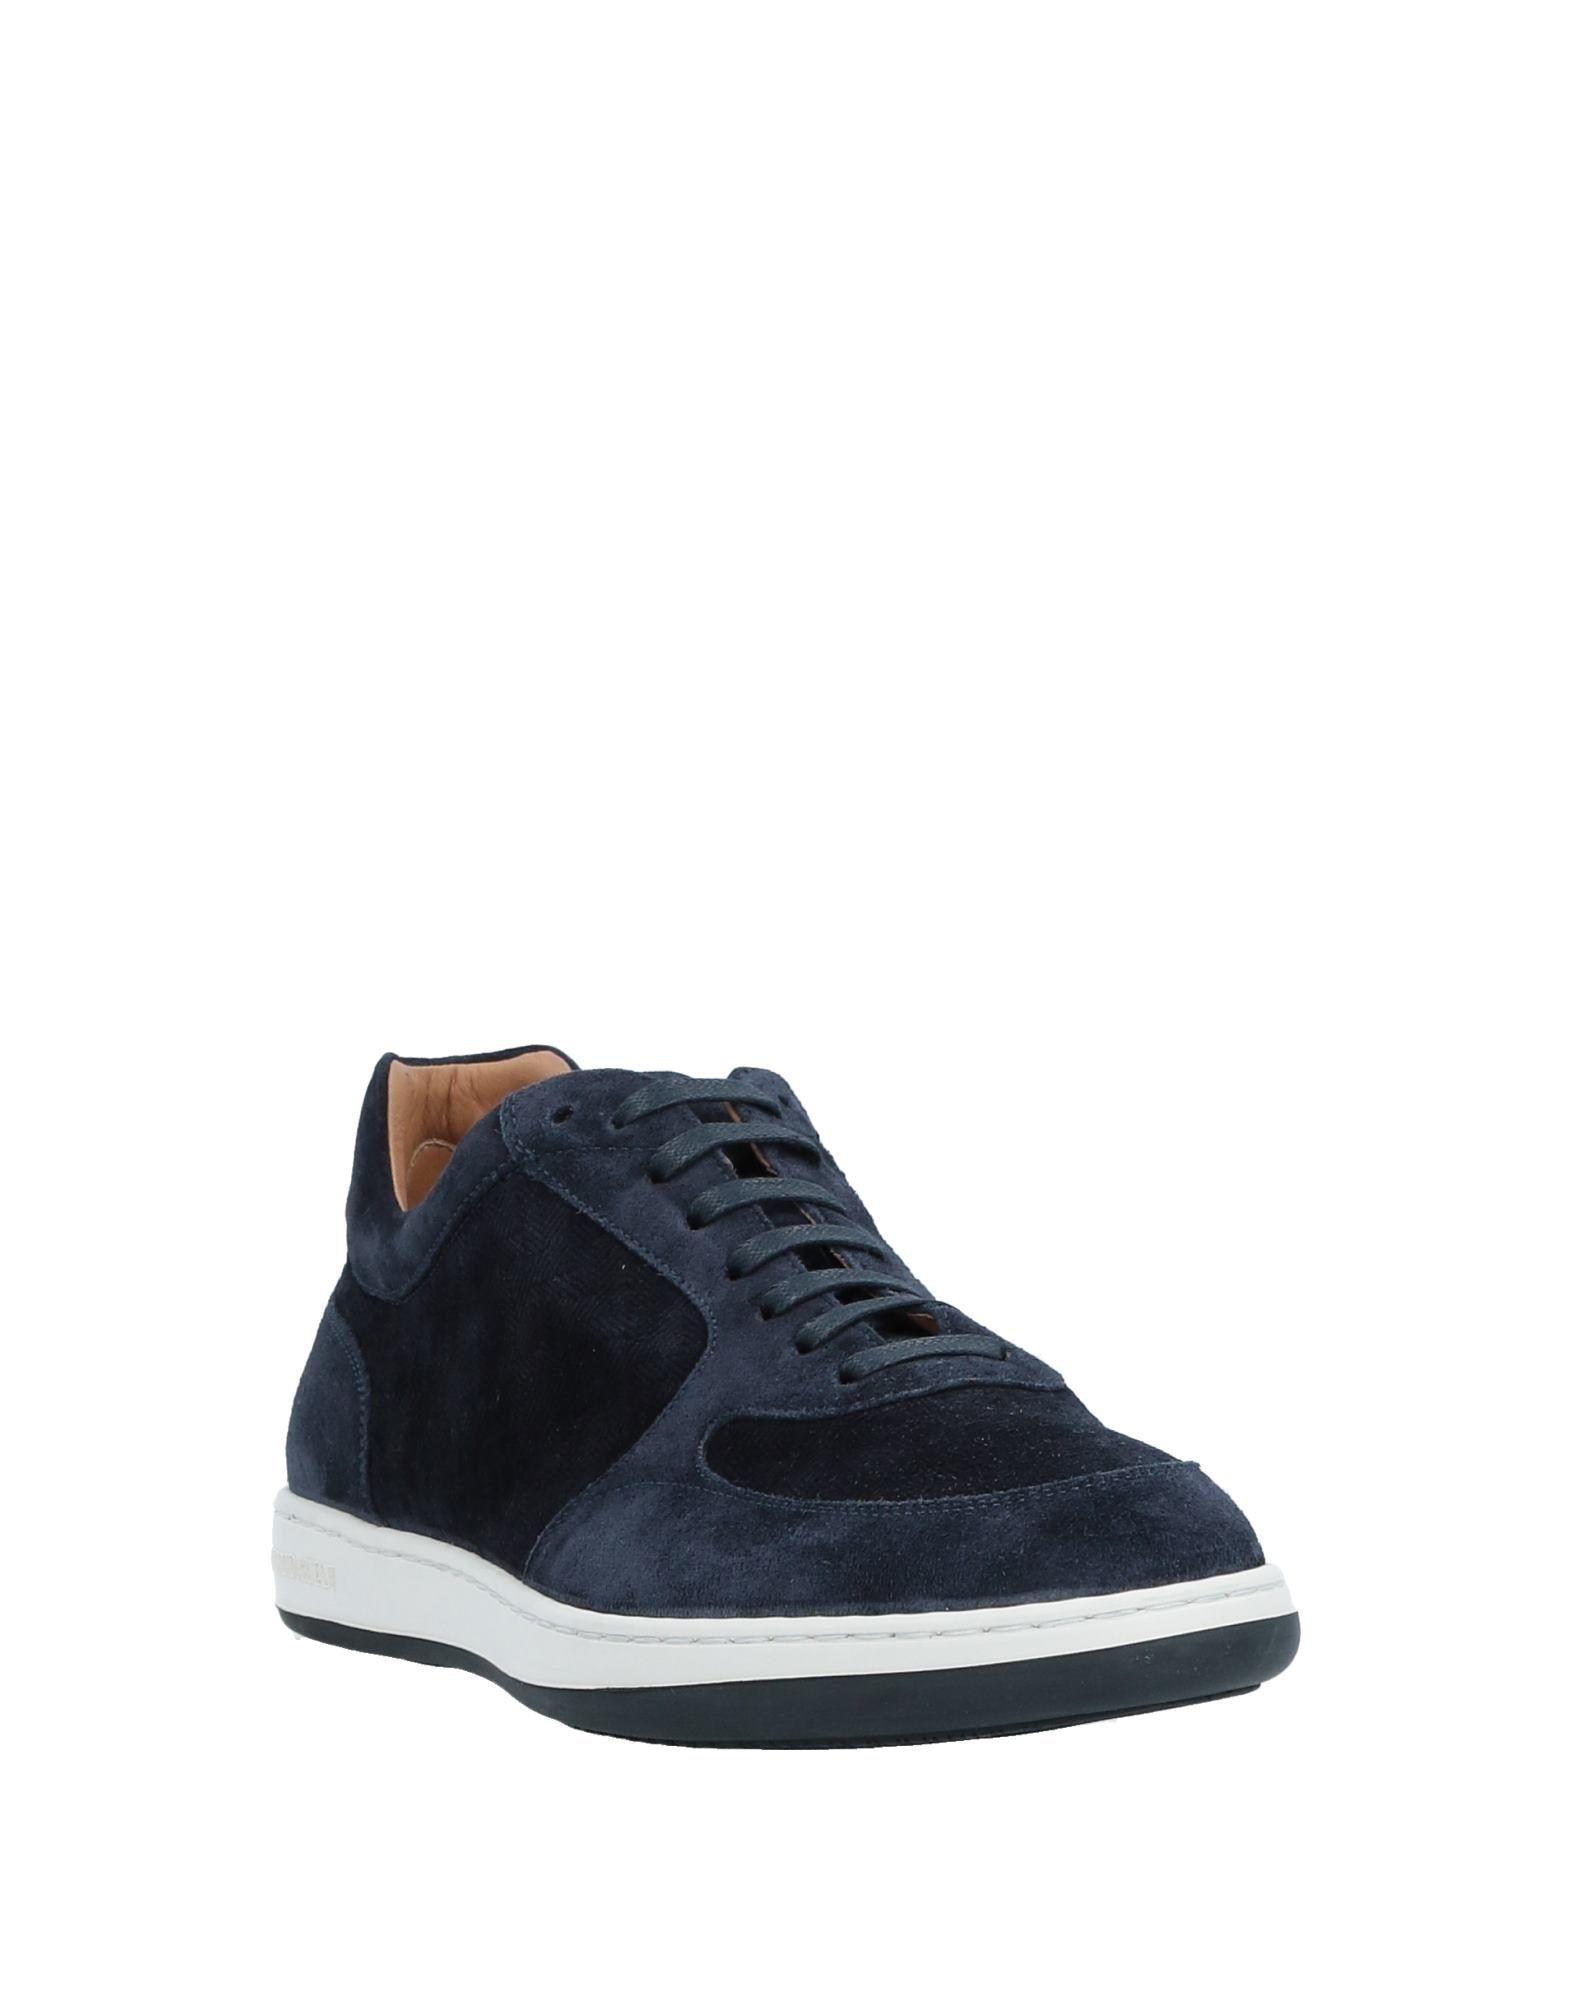 Giorgio Armani Herren Sneakers Herren Armani  11517589LB  141a02